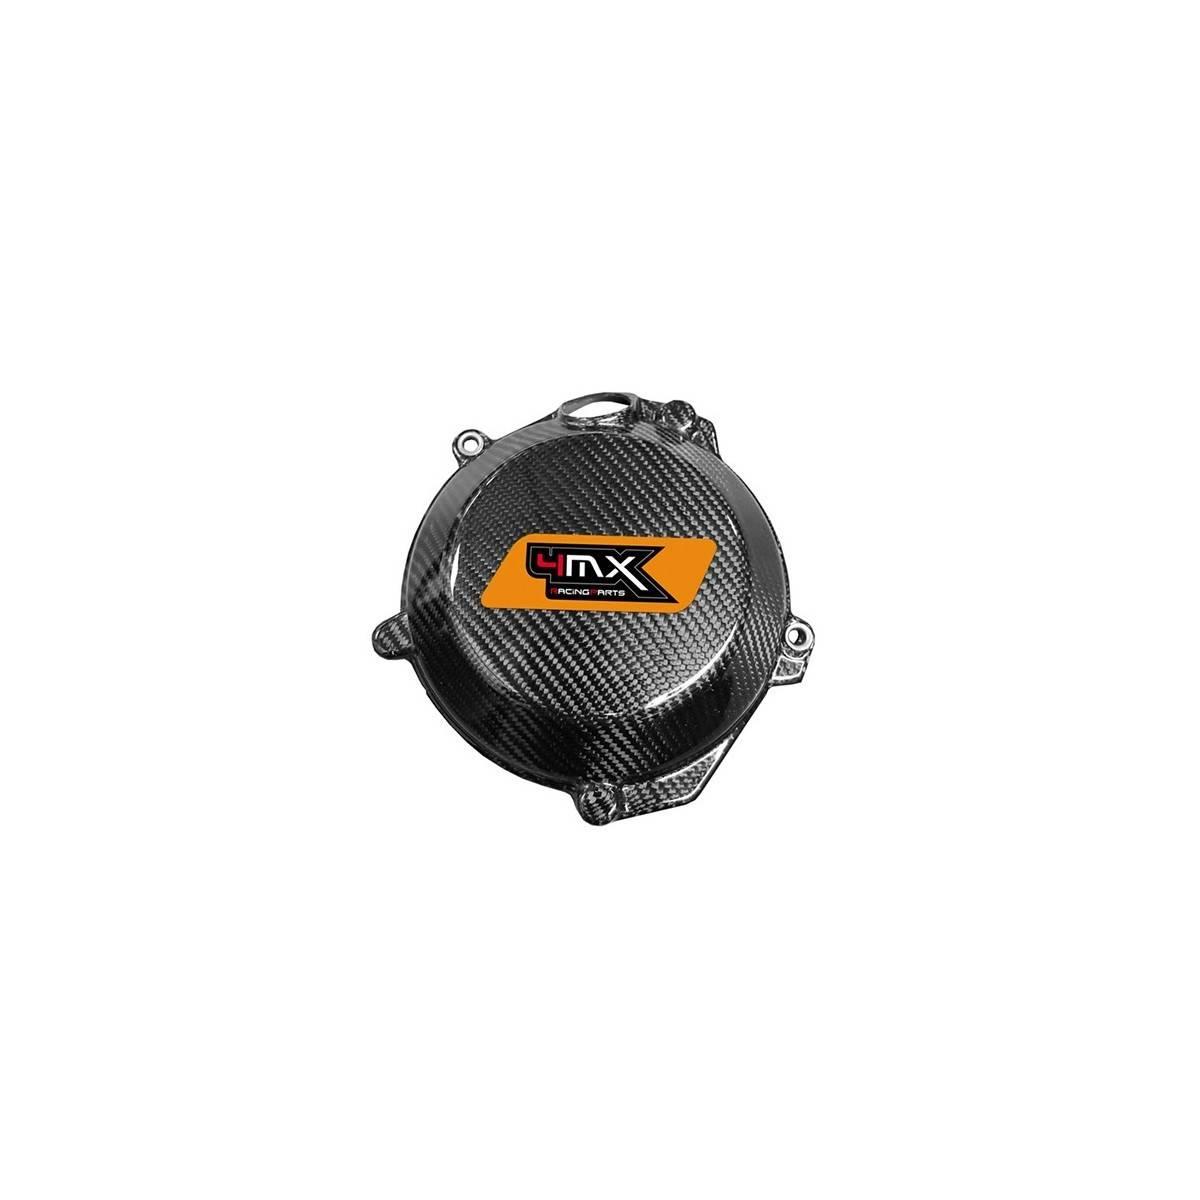 4MX17.02 - Protector Tapa Embrague Carbono Ktm Sx125 150 16 17 Xcw 125 150 16 17 Husky Te125 Tc125 2017